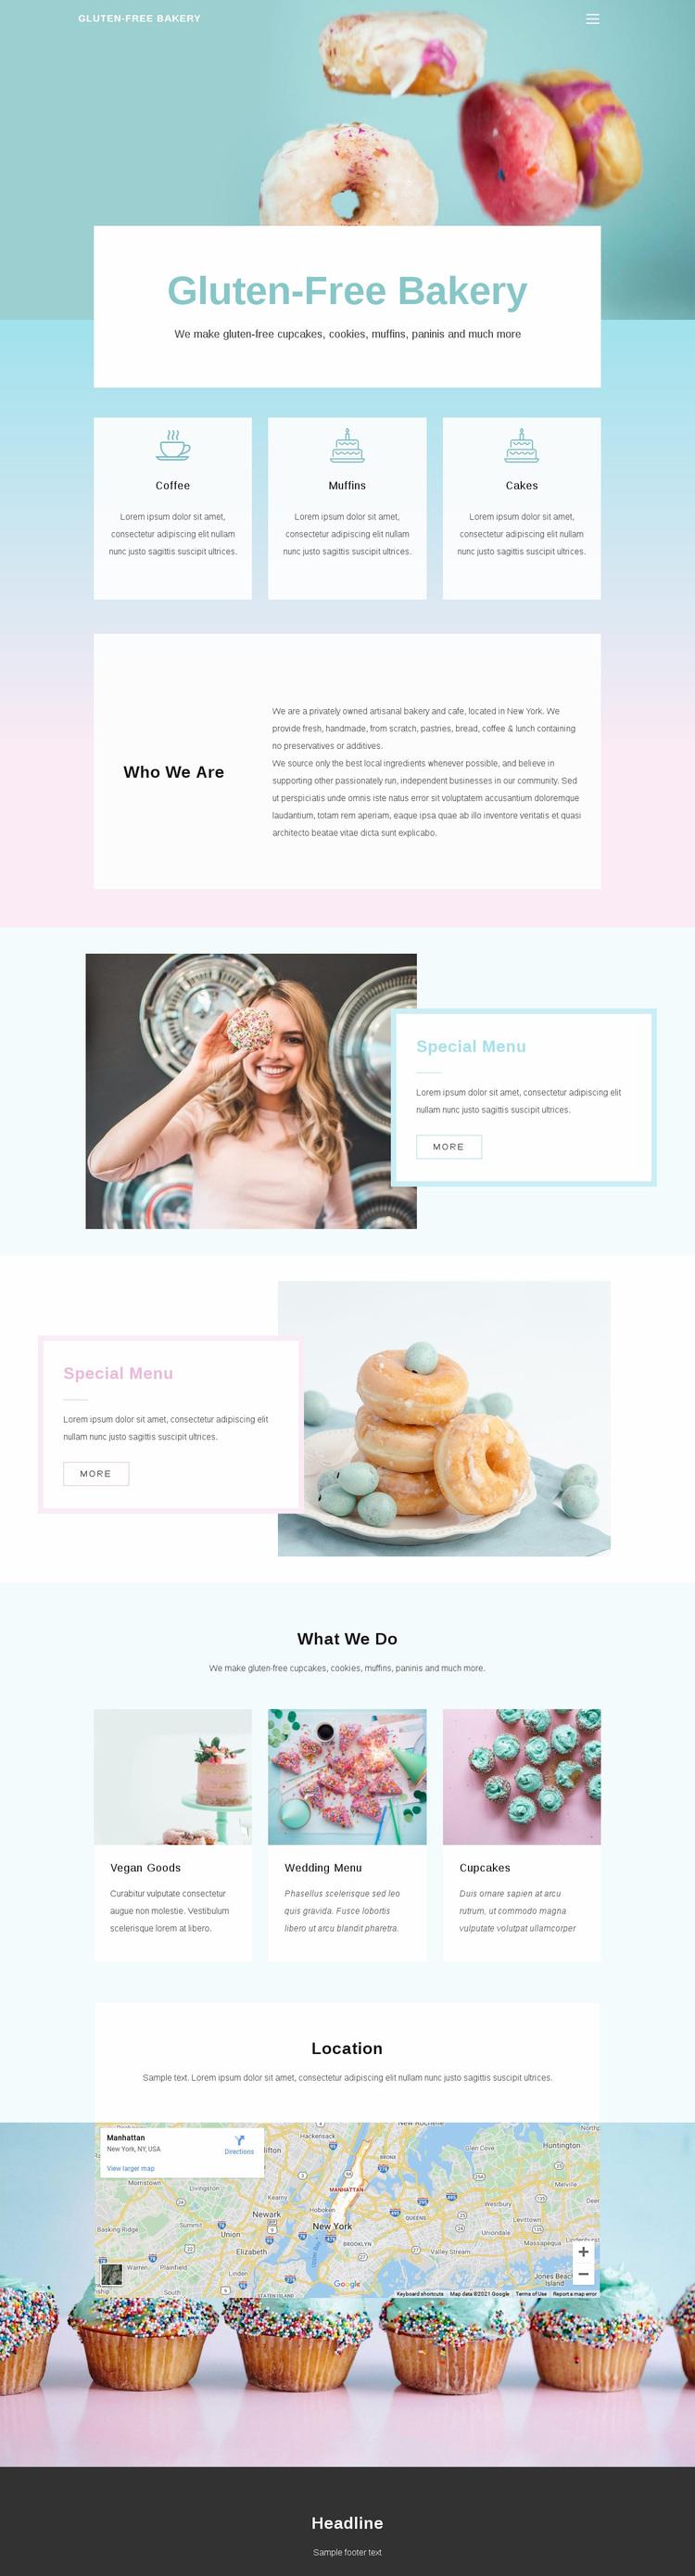 Gluten-Free Backery Website Design